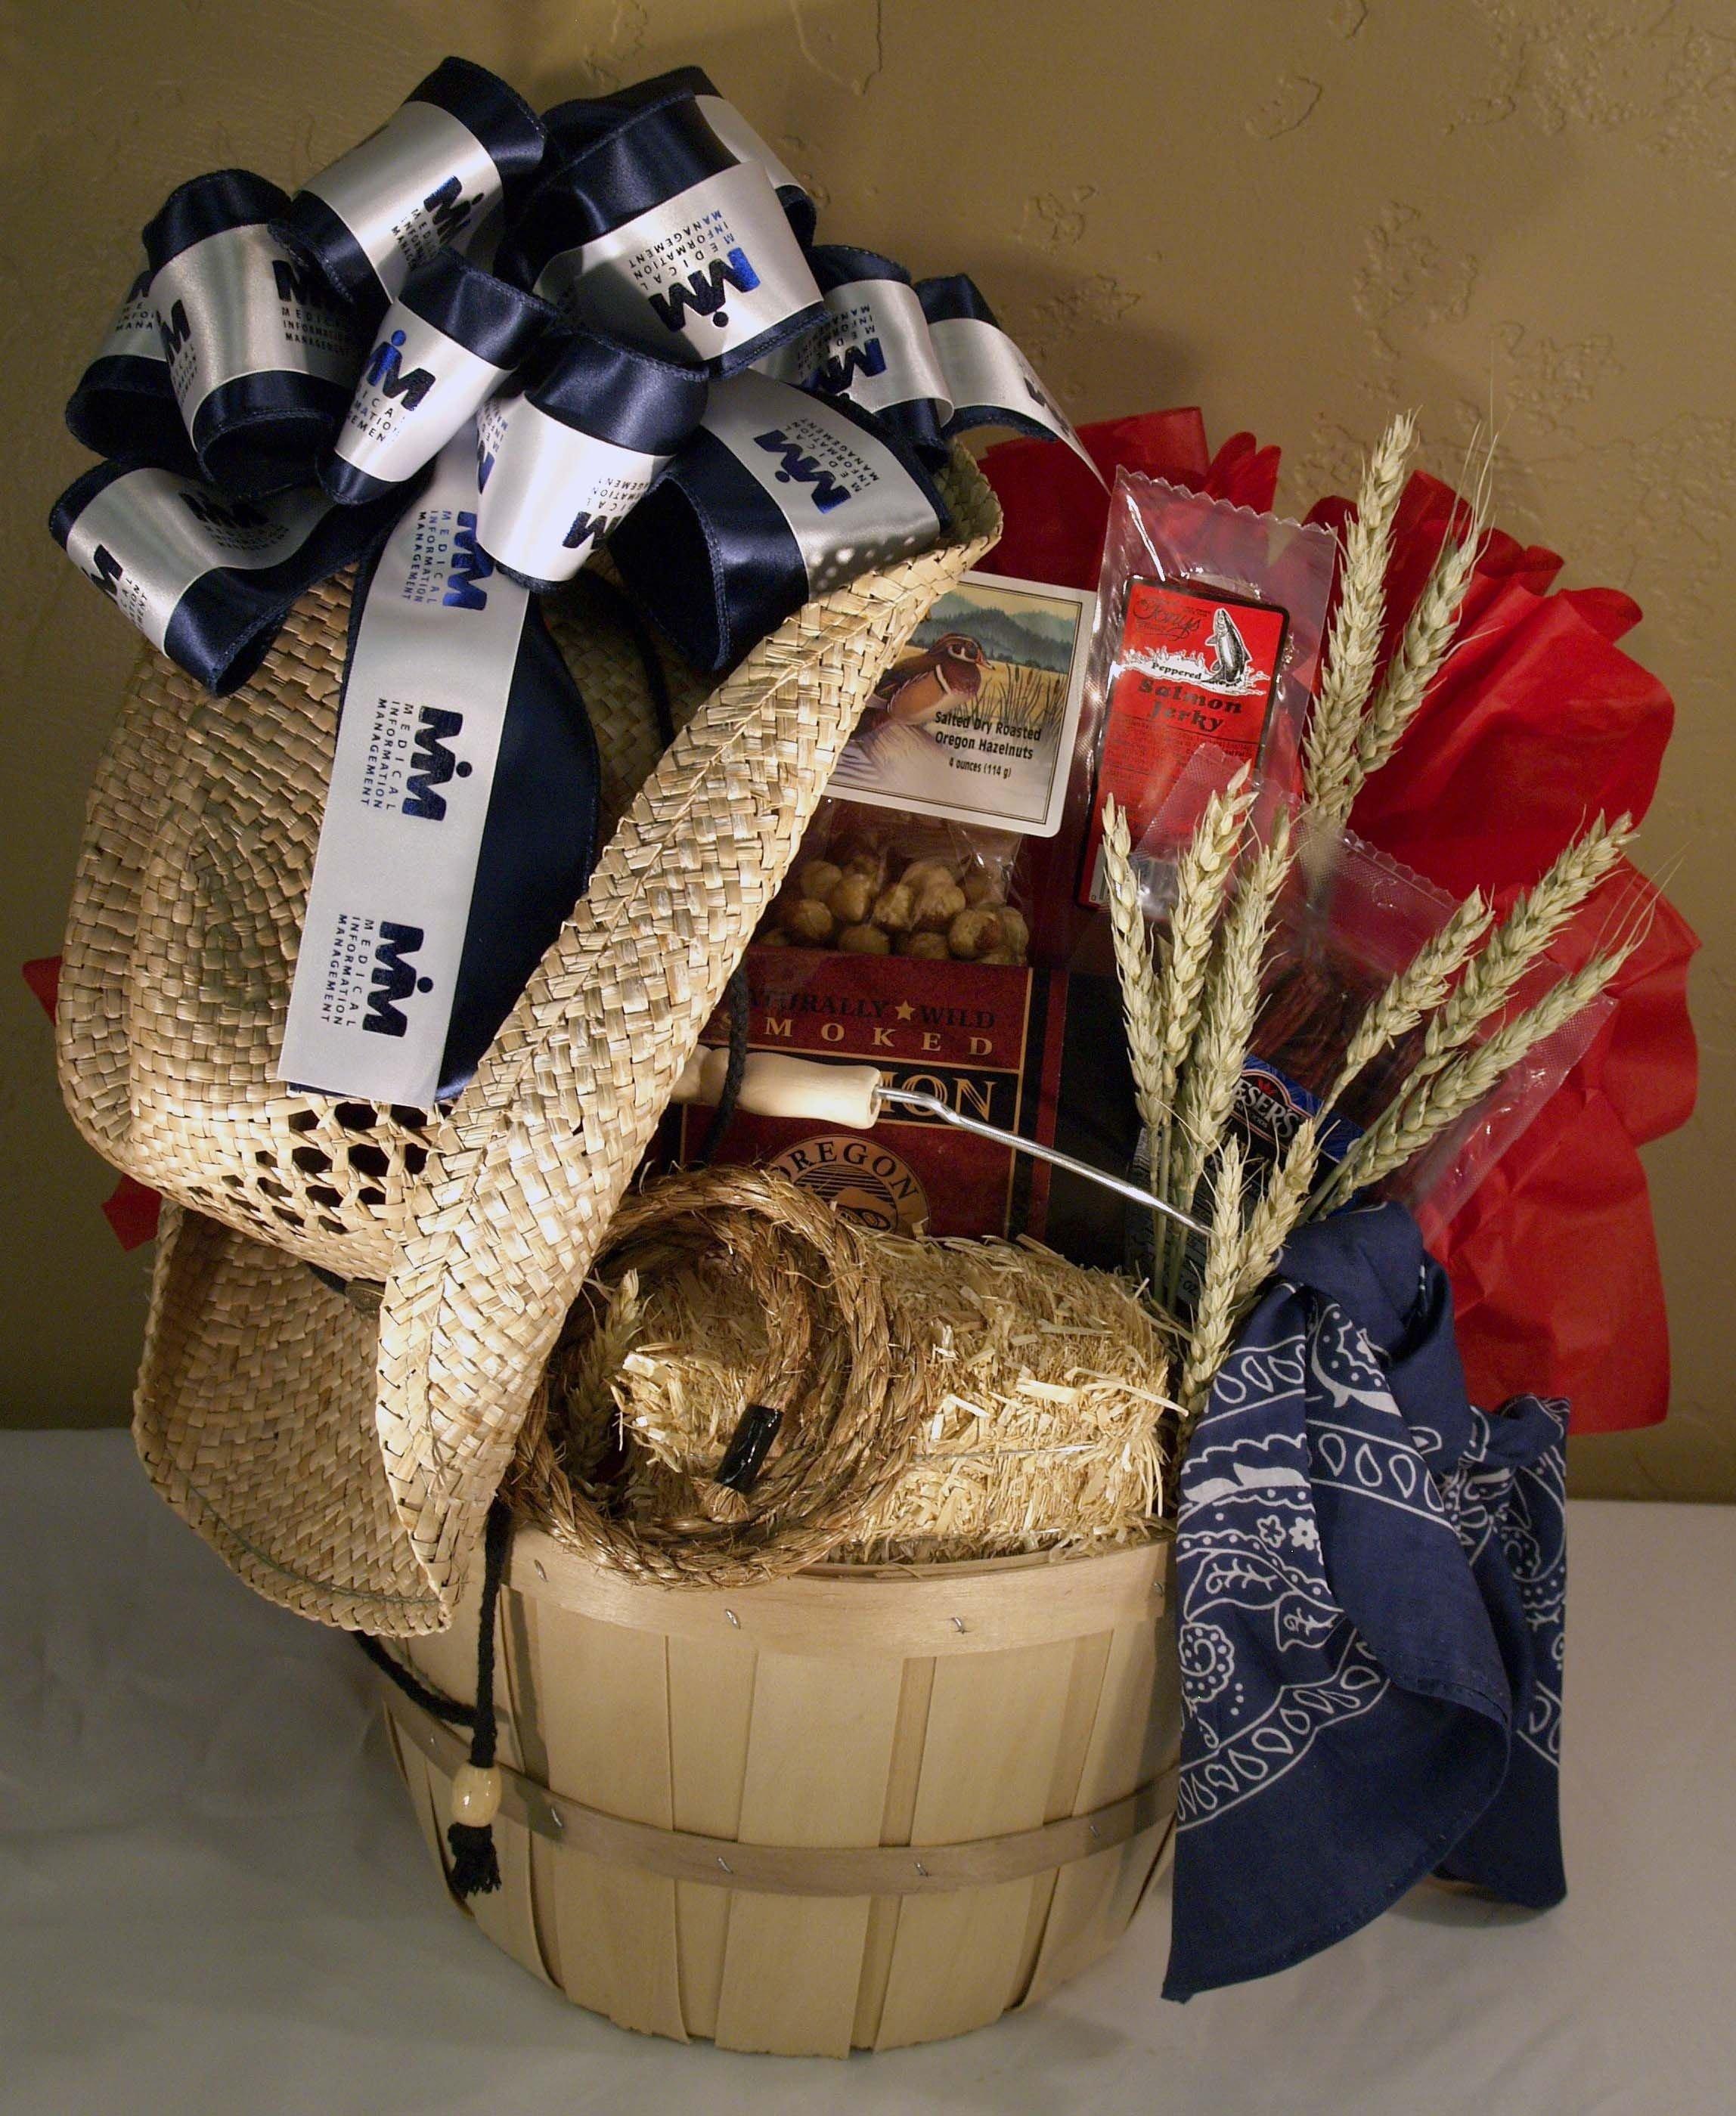 10 Cute Theme Basket Ideas For Silent Auction western themed basket mr whs pinterest basket ideas silent 2021